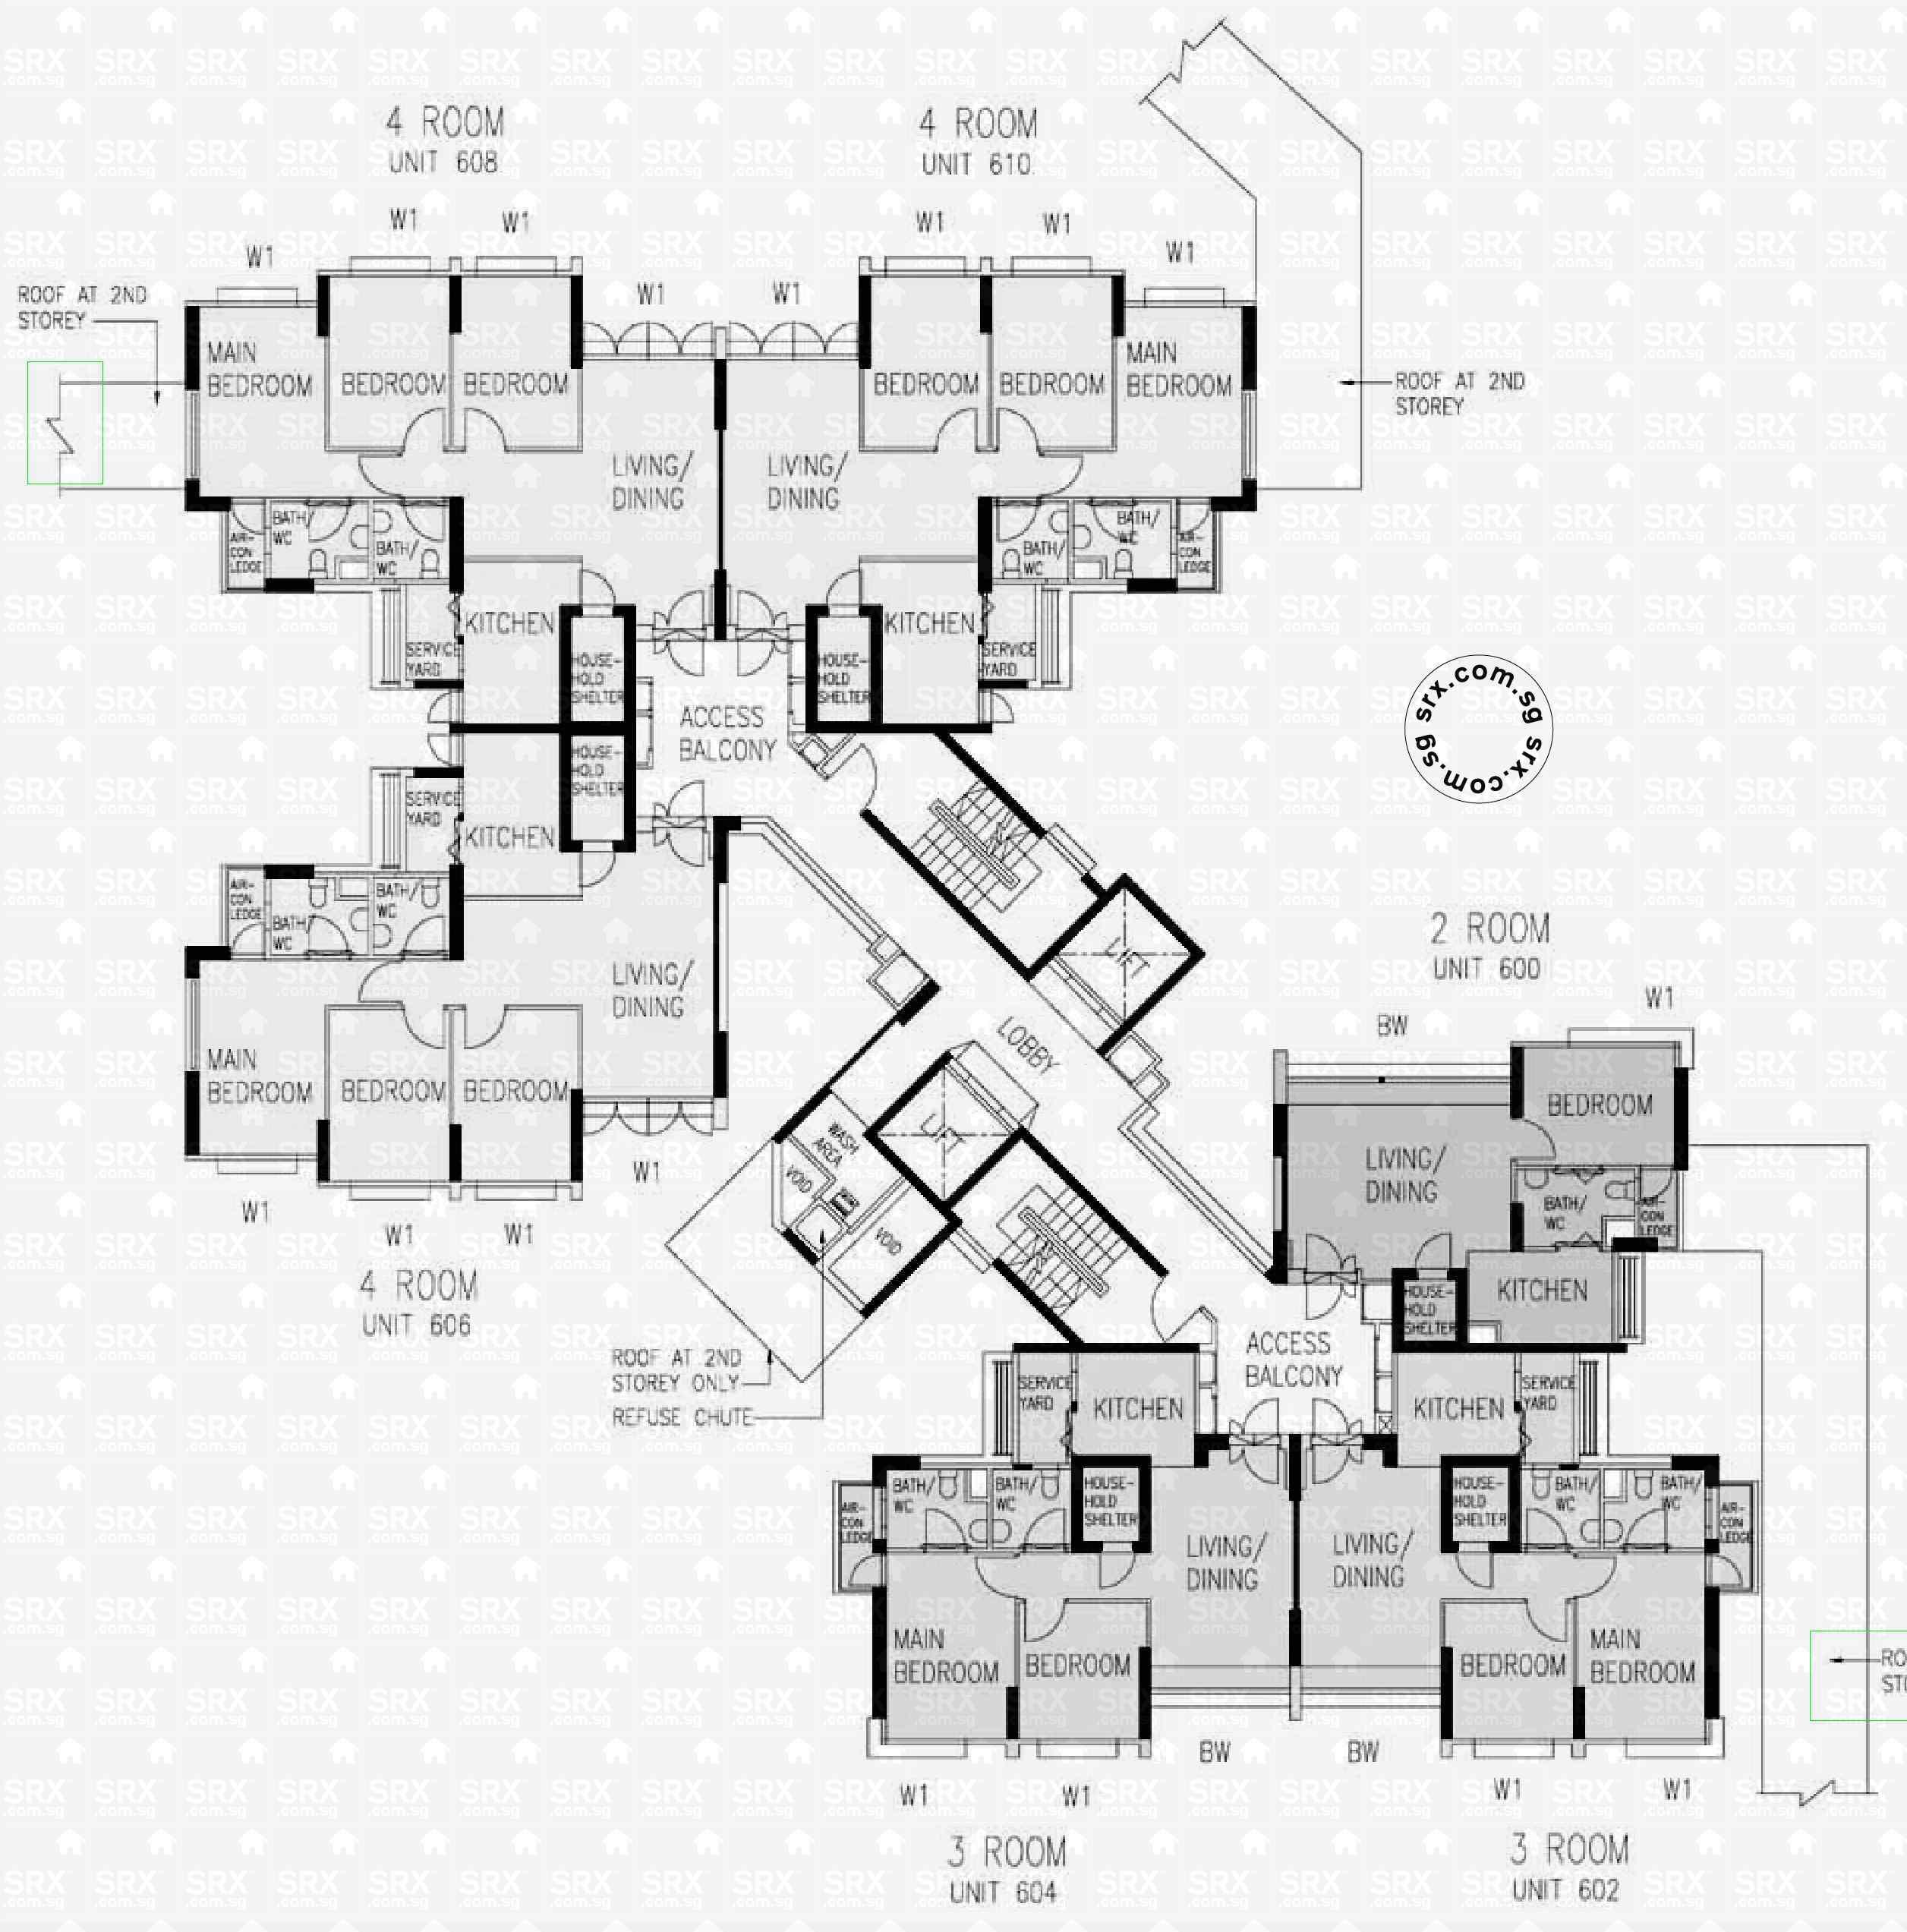 601b Punggol Central S 822601 Hdb Details Srx Property